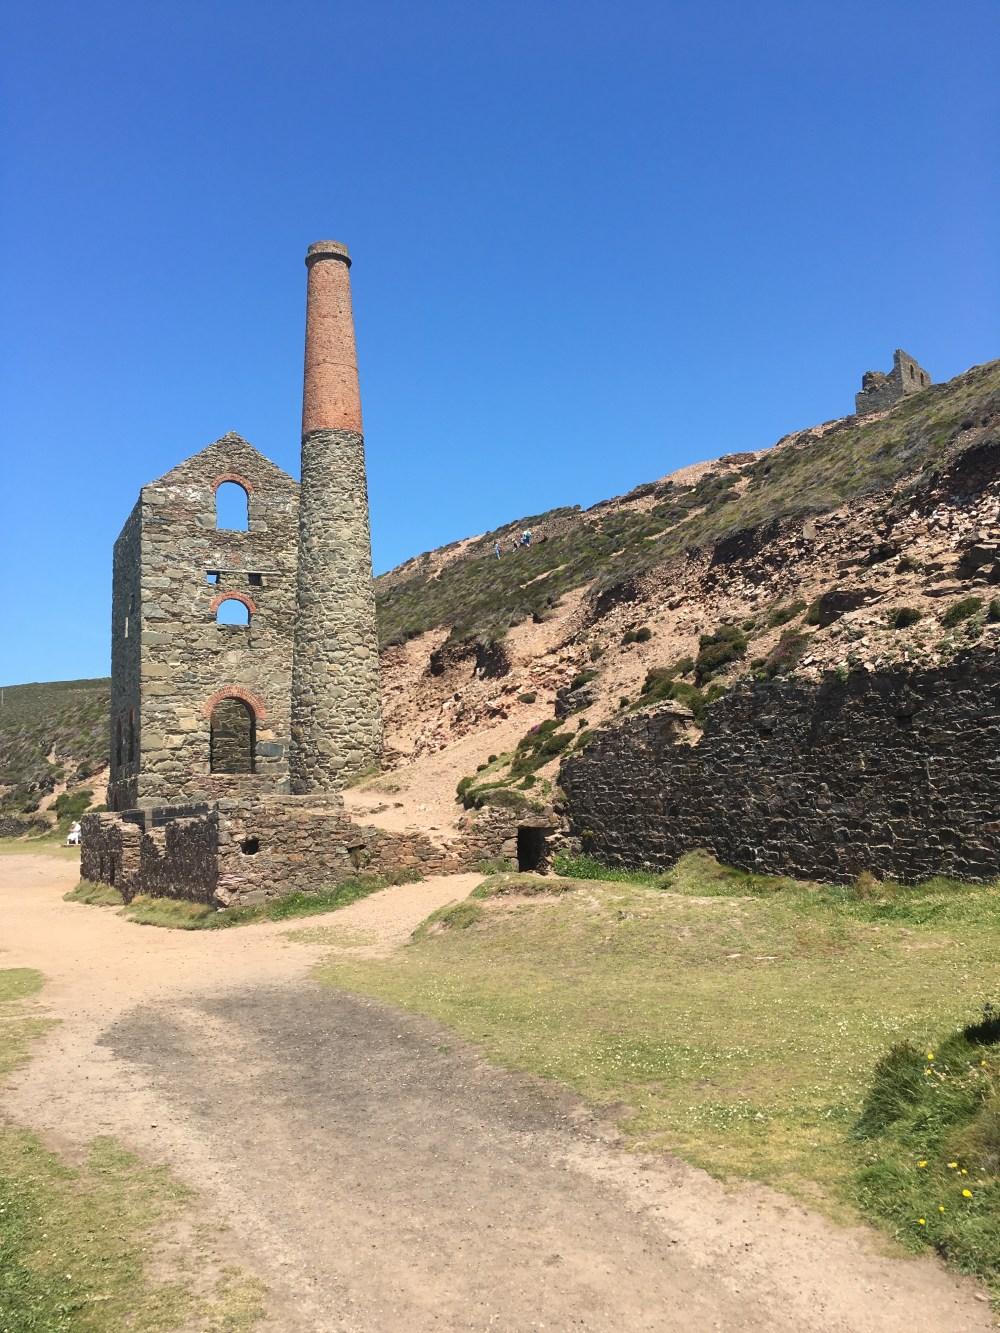 Wheal Coates, a UNESCO World Heritage site near Chapel Porth, Cornwall